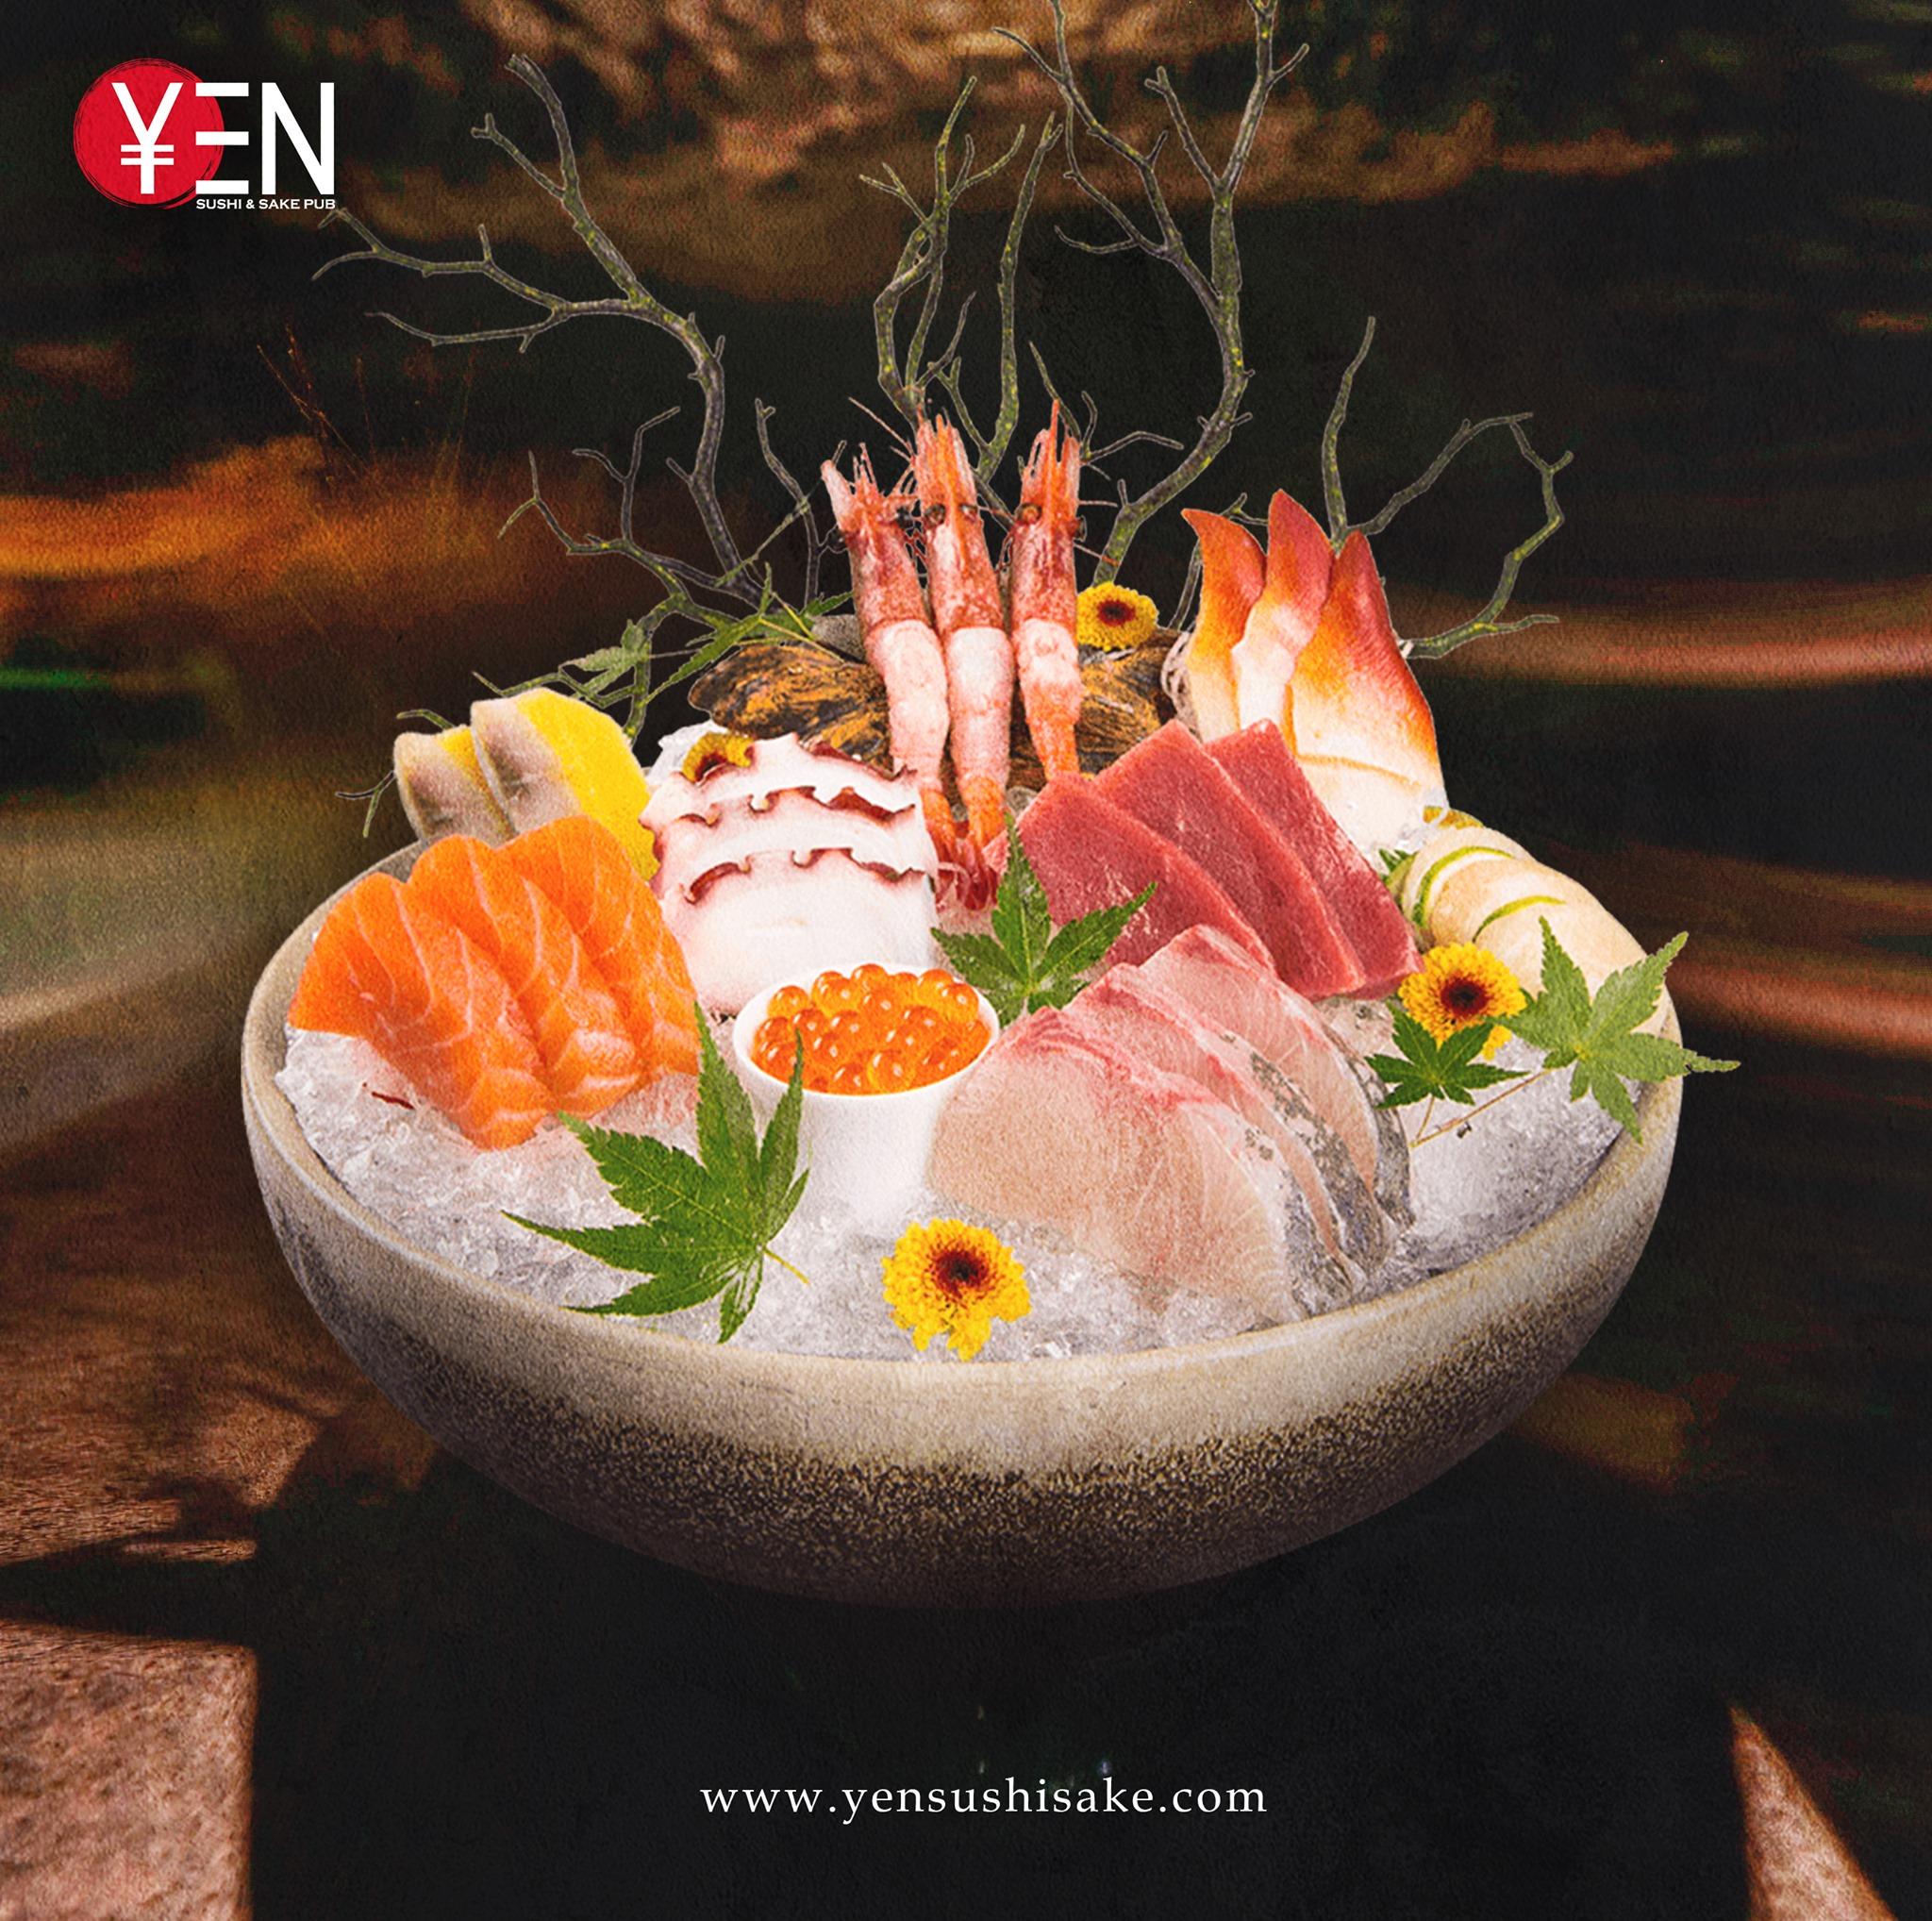 Yen Sushi Sake - Quan An Nhat o Go Vap